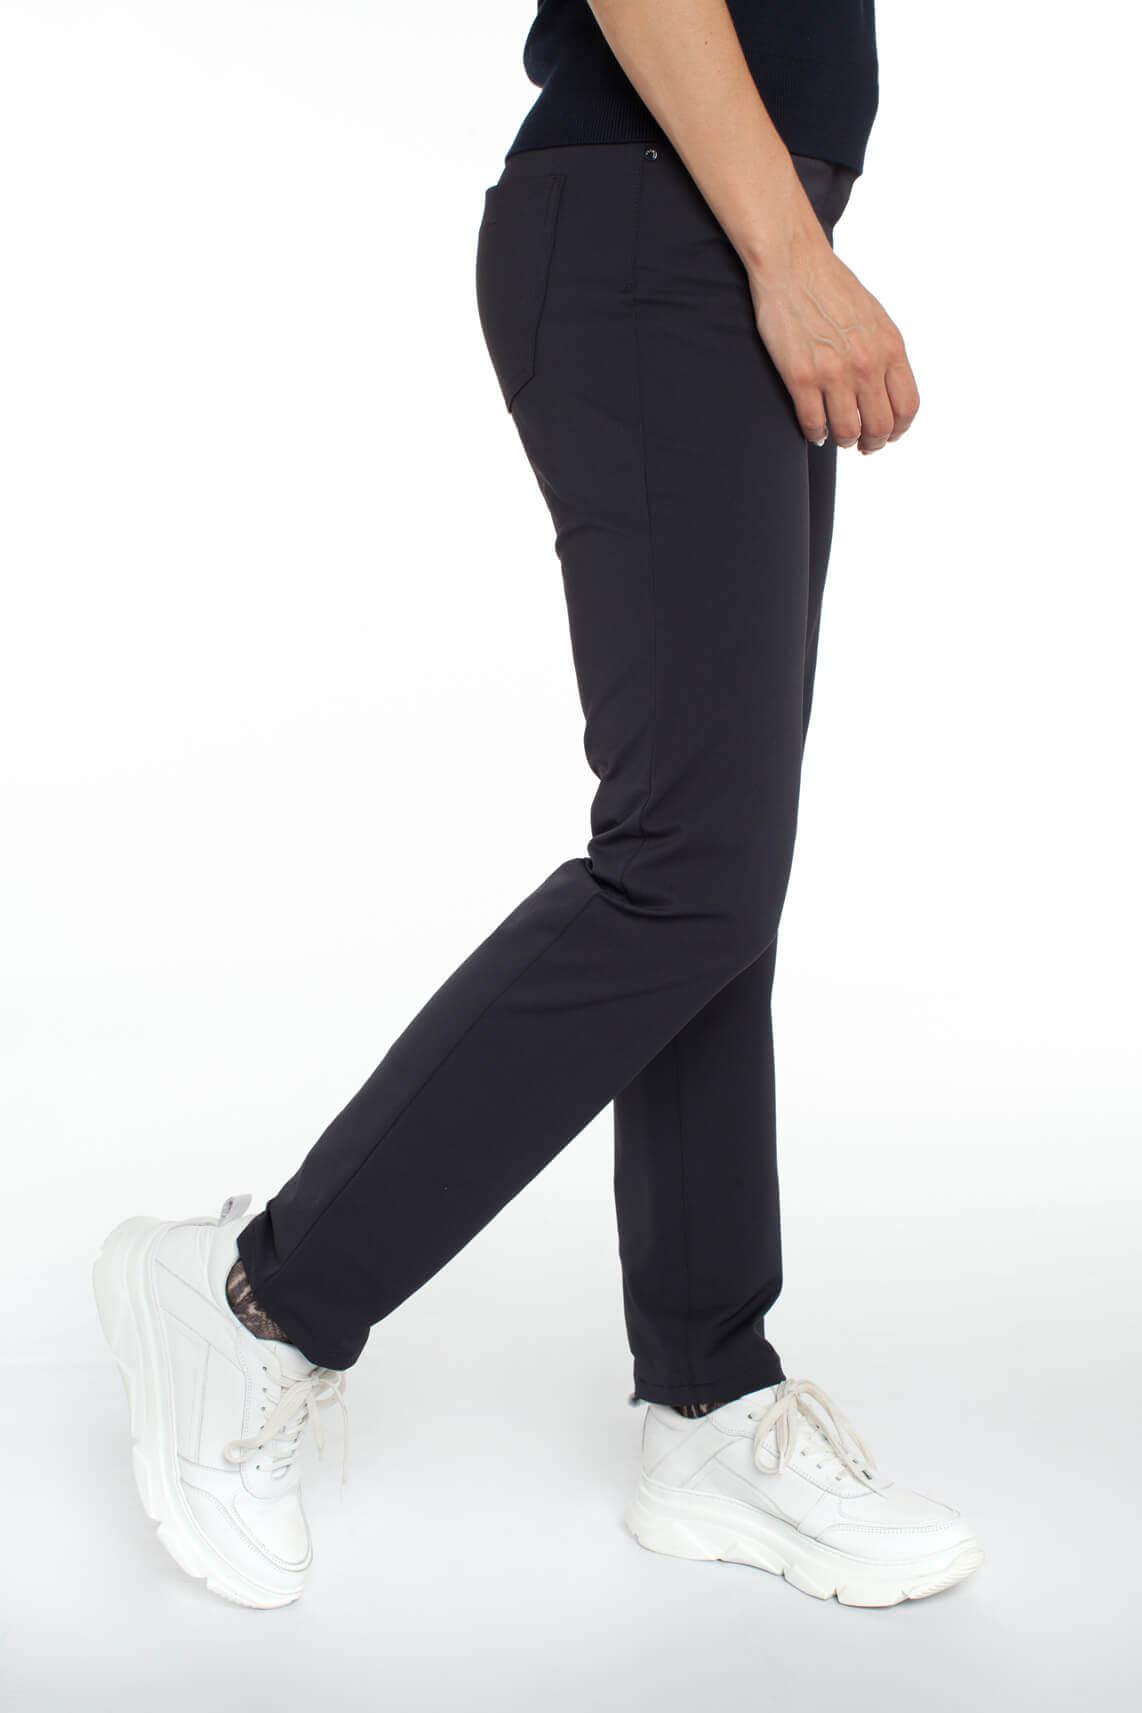 Rosner Dames Audrey bodyshaping pantalon Blauw